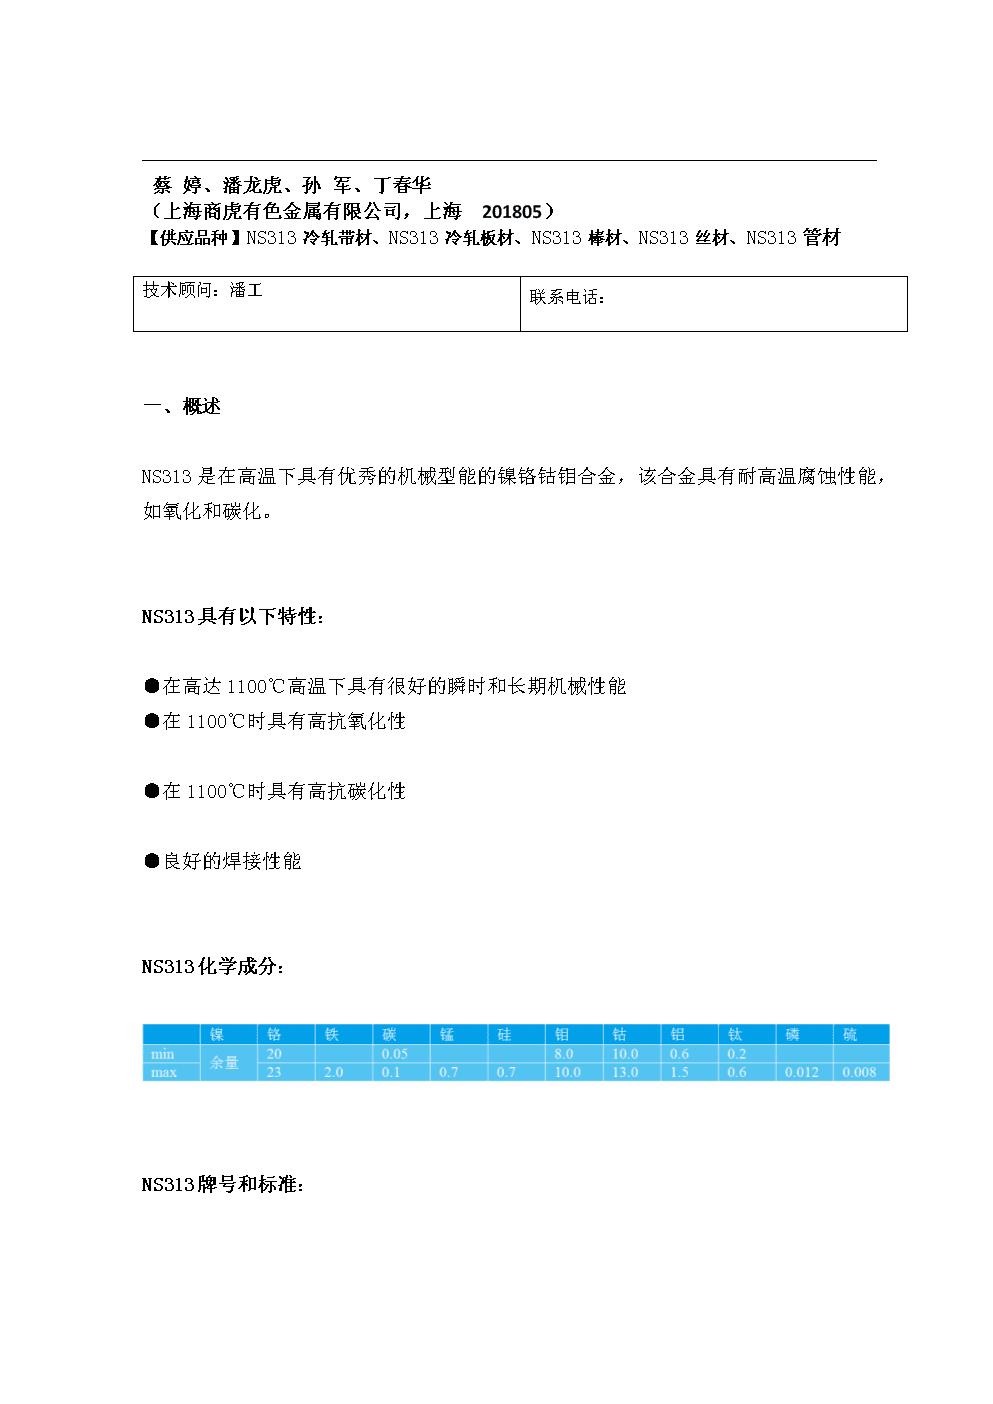 NS313(N06617)-上海商虎合金技术.doc